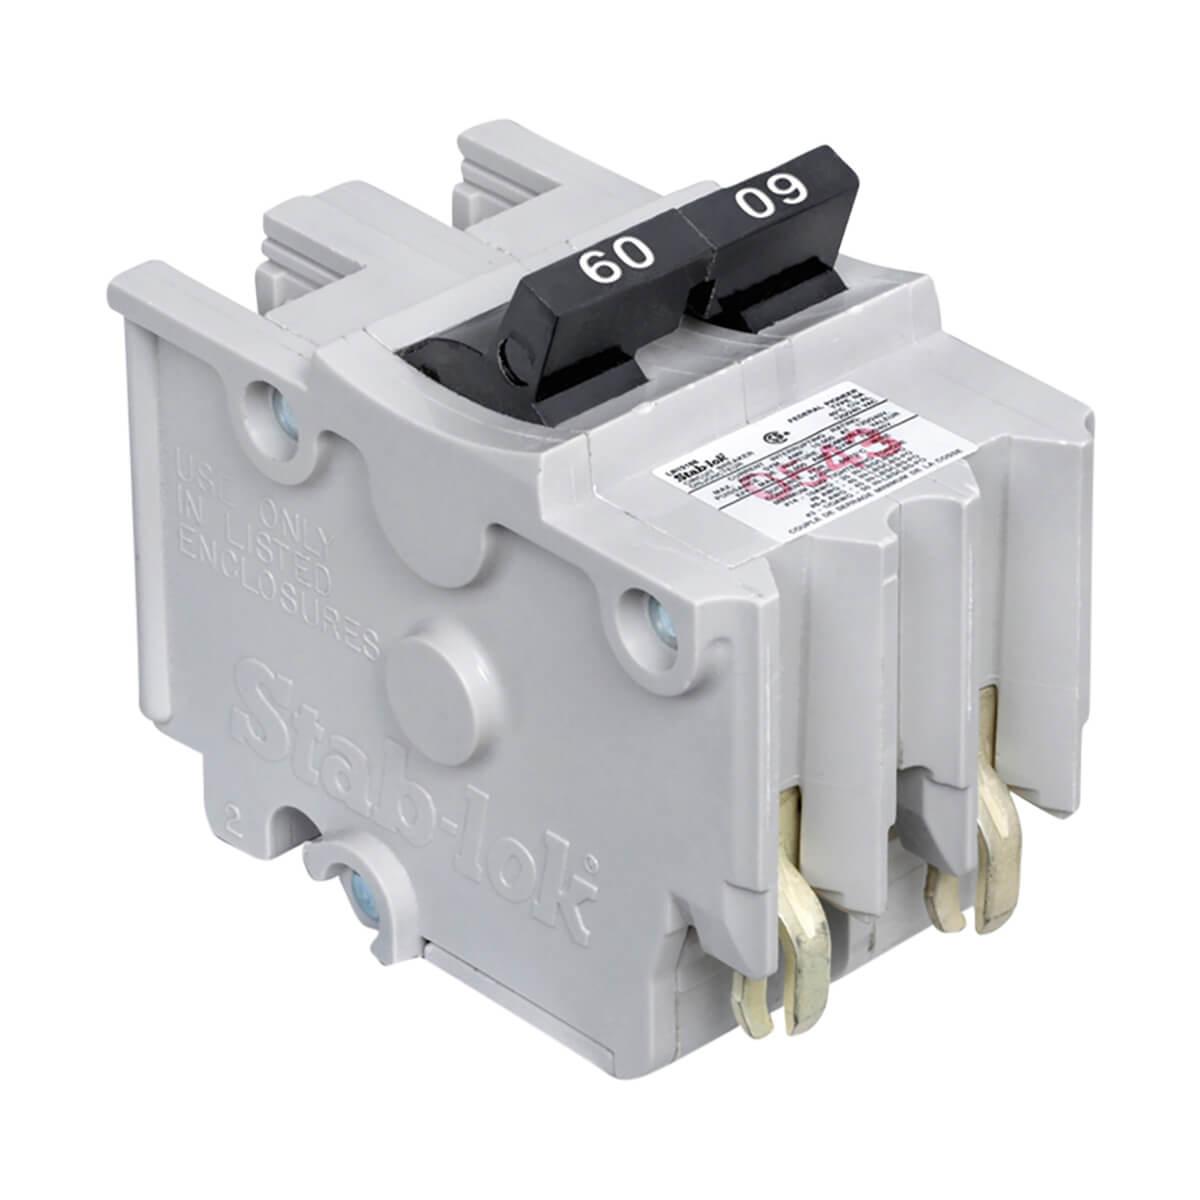 Stab-lok (NA) Double Pole 60 Amp Plug-On Circuit Breaker